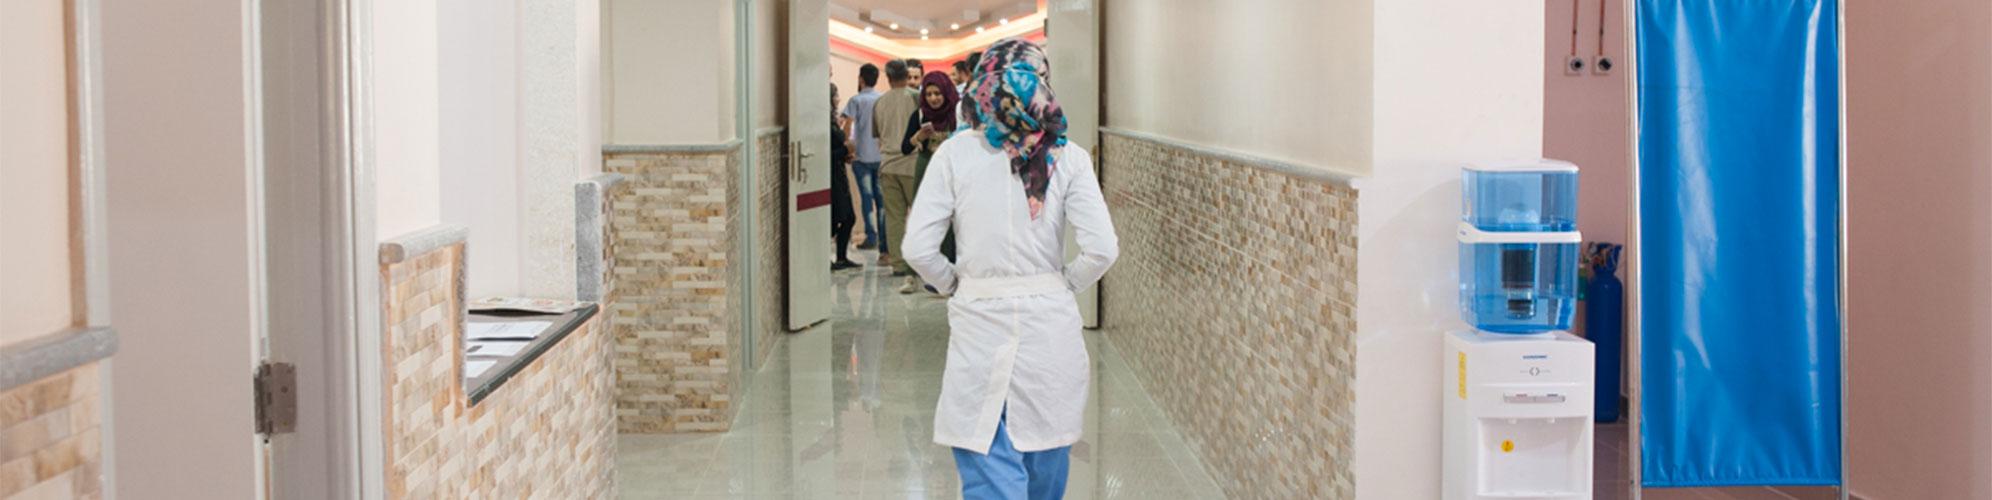 DARNA_Ospedale_inner